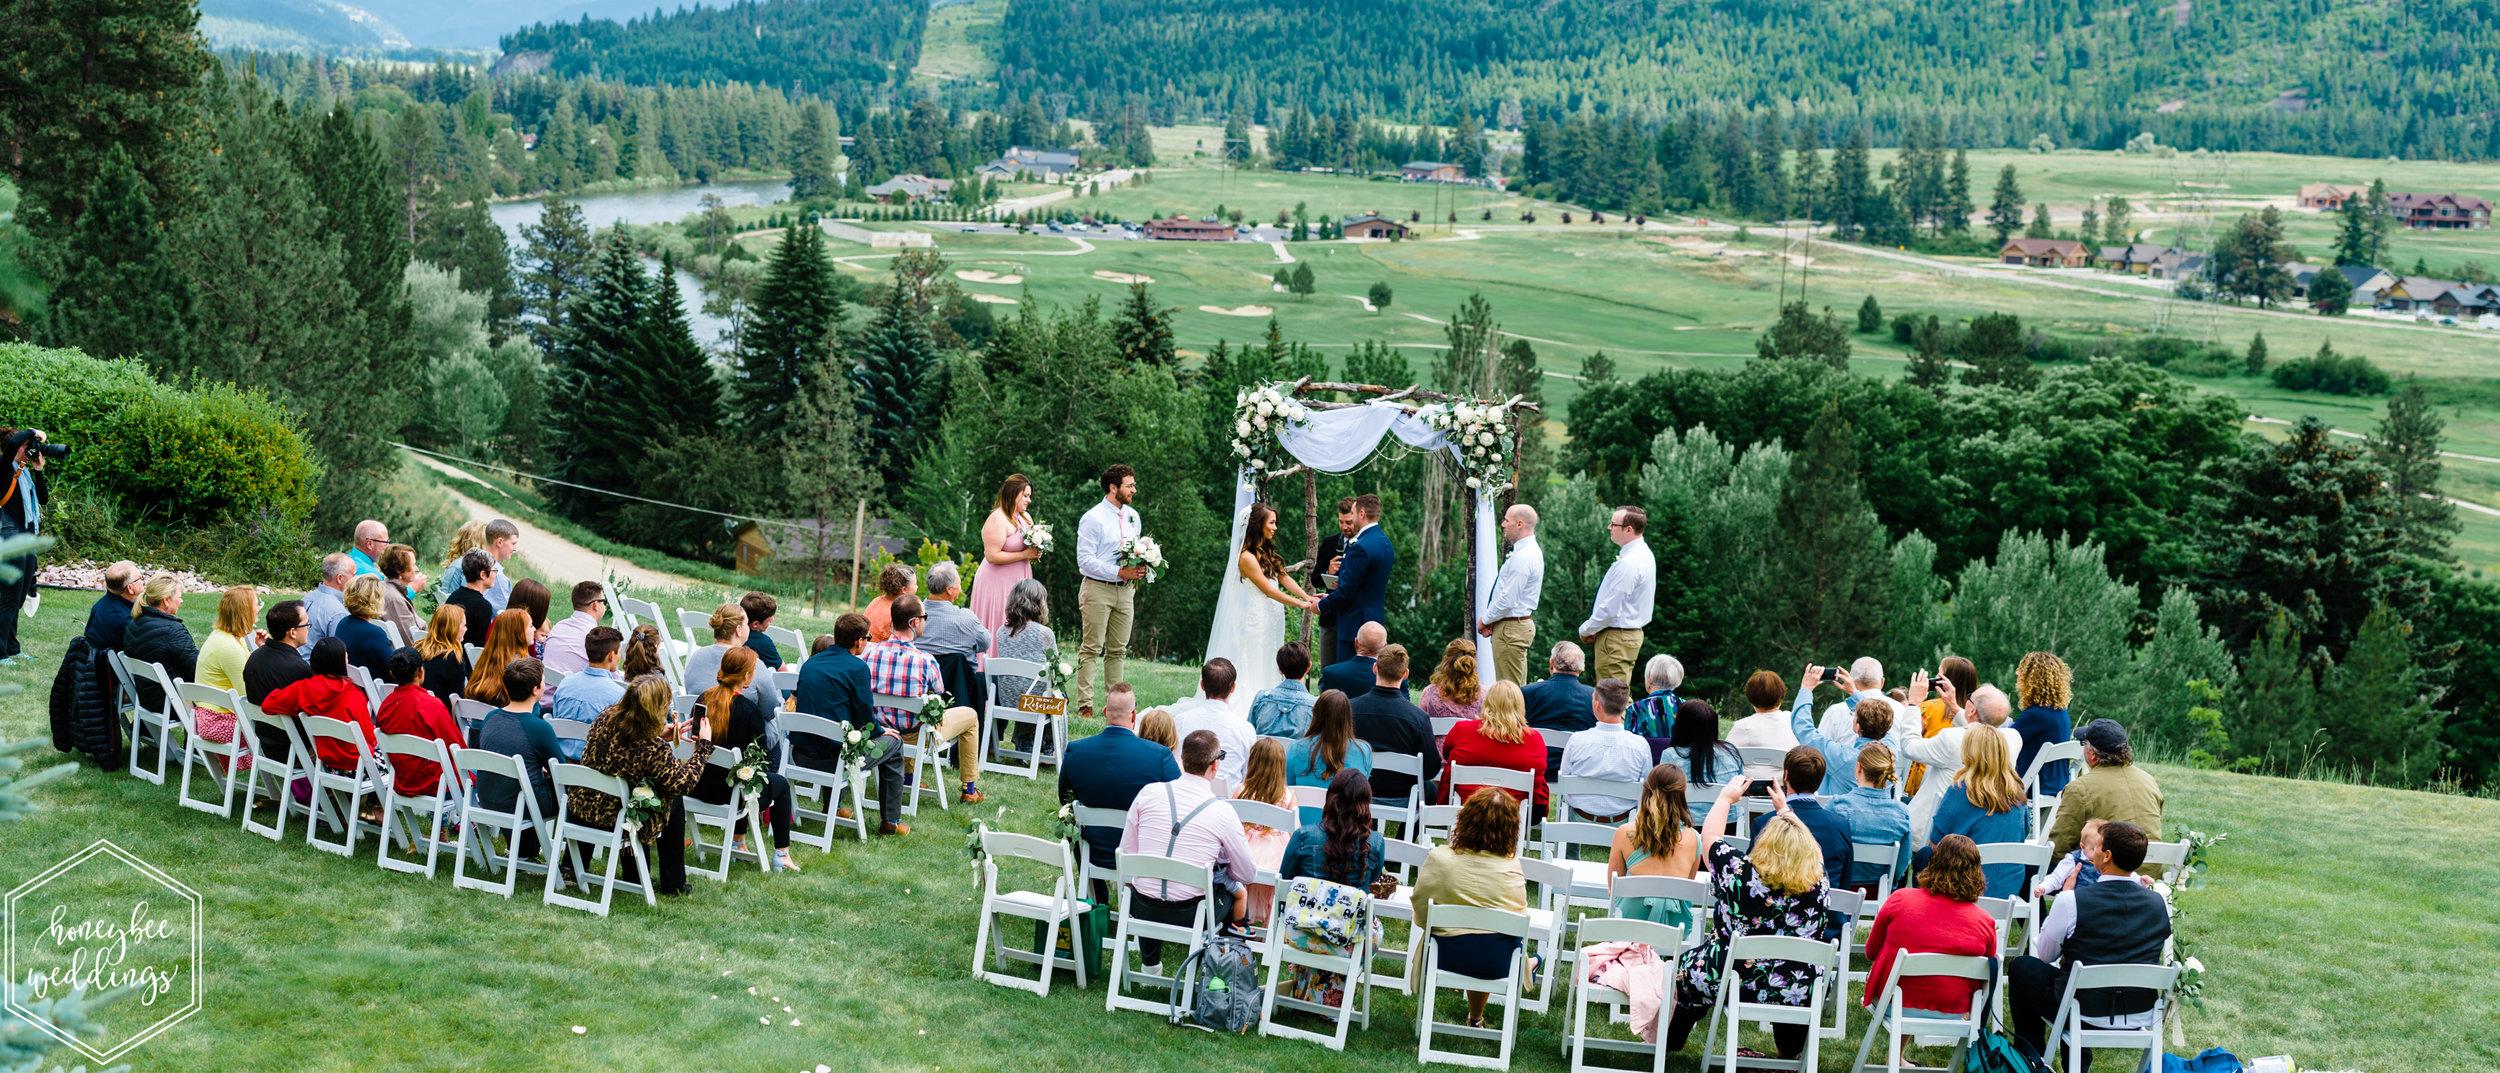 267Montana Wedding Photographer_Missoula Wedding_Honeybee Weddings_Devlin & Jacob_June 22, 2019-598-Pano.jpg